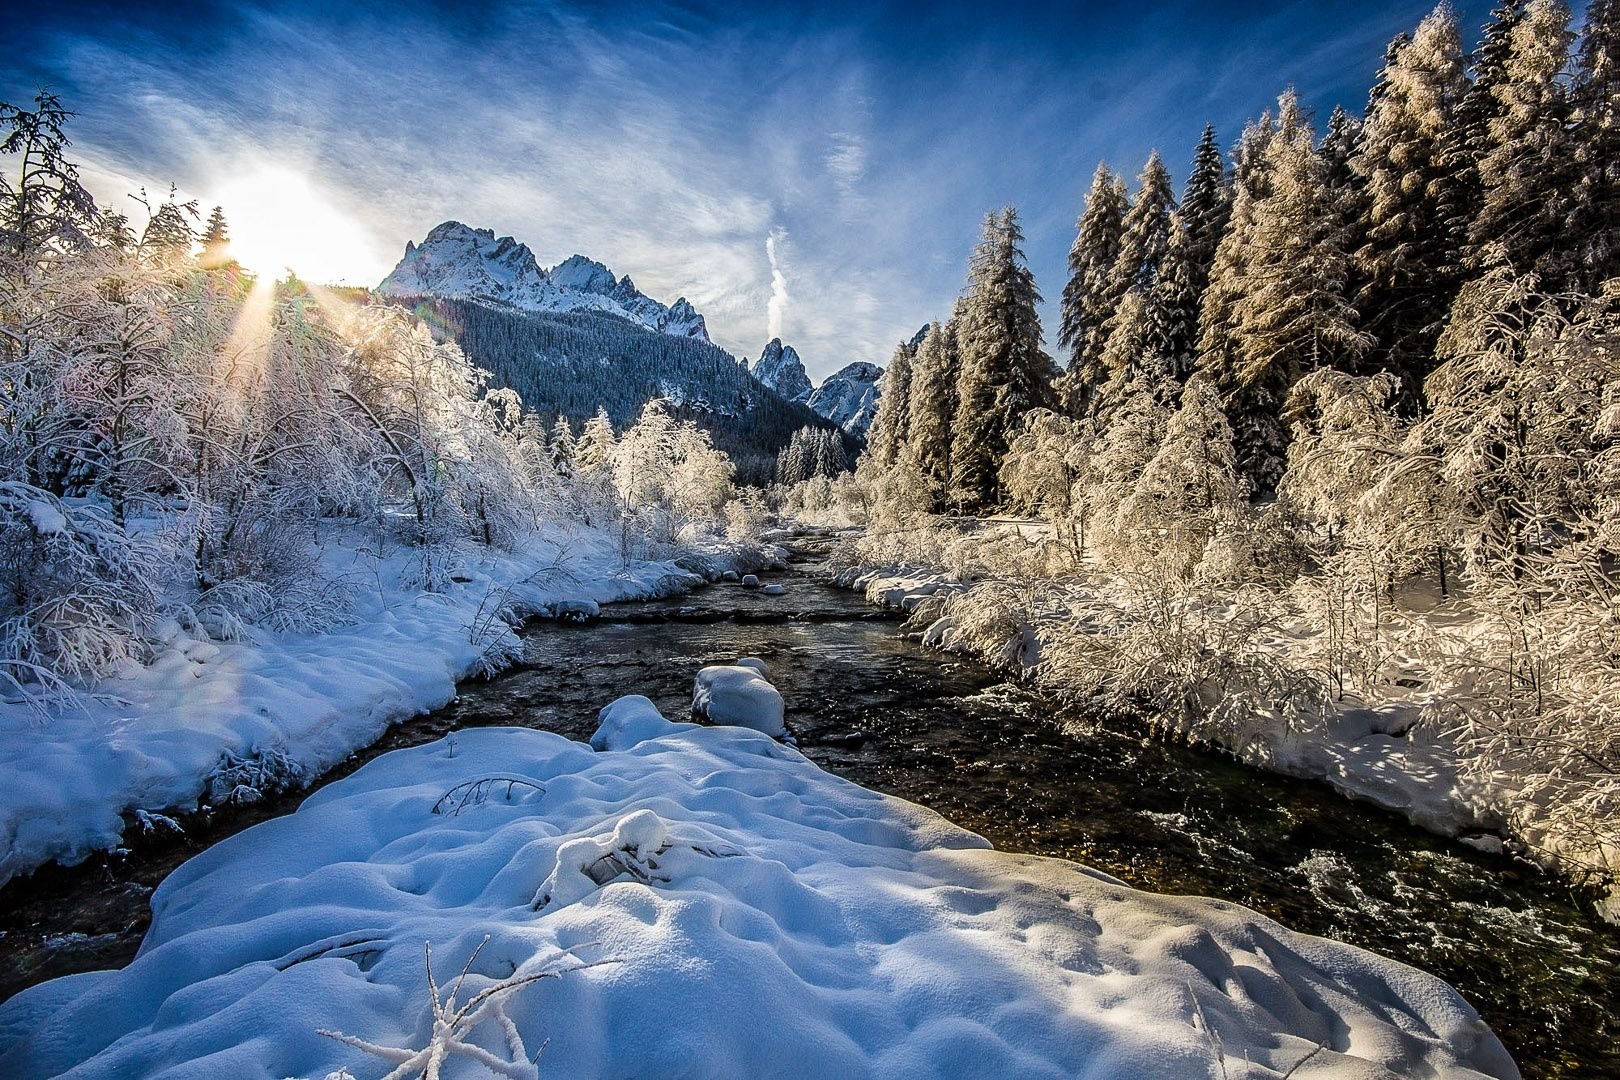 Montagna, neve, innevata, torrente, fiume, sole, controluce, alberi, bosco con neve, by Gabriele Pavan on 500px